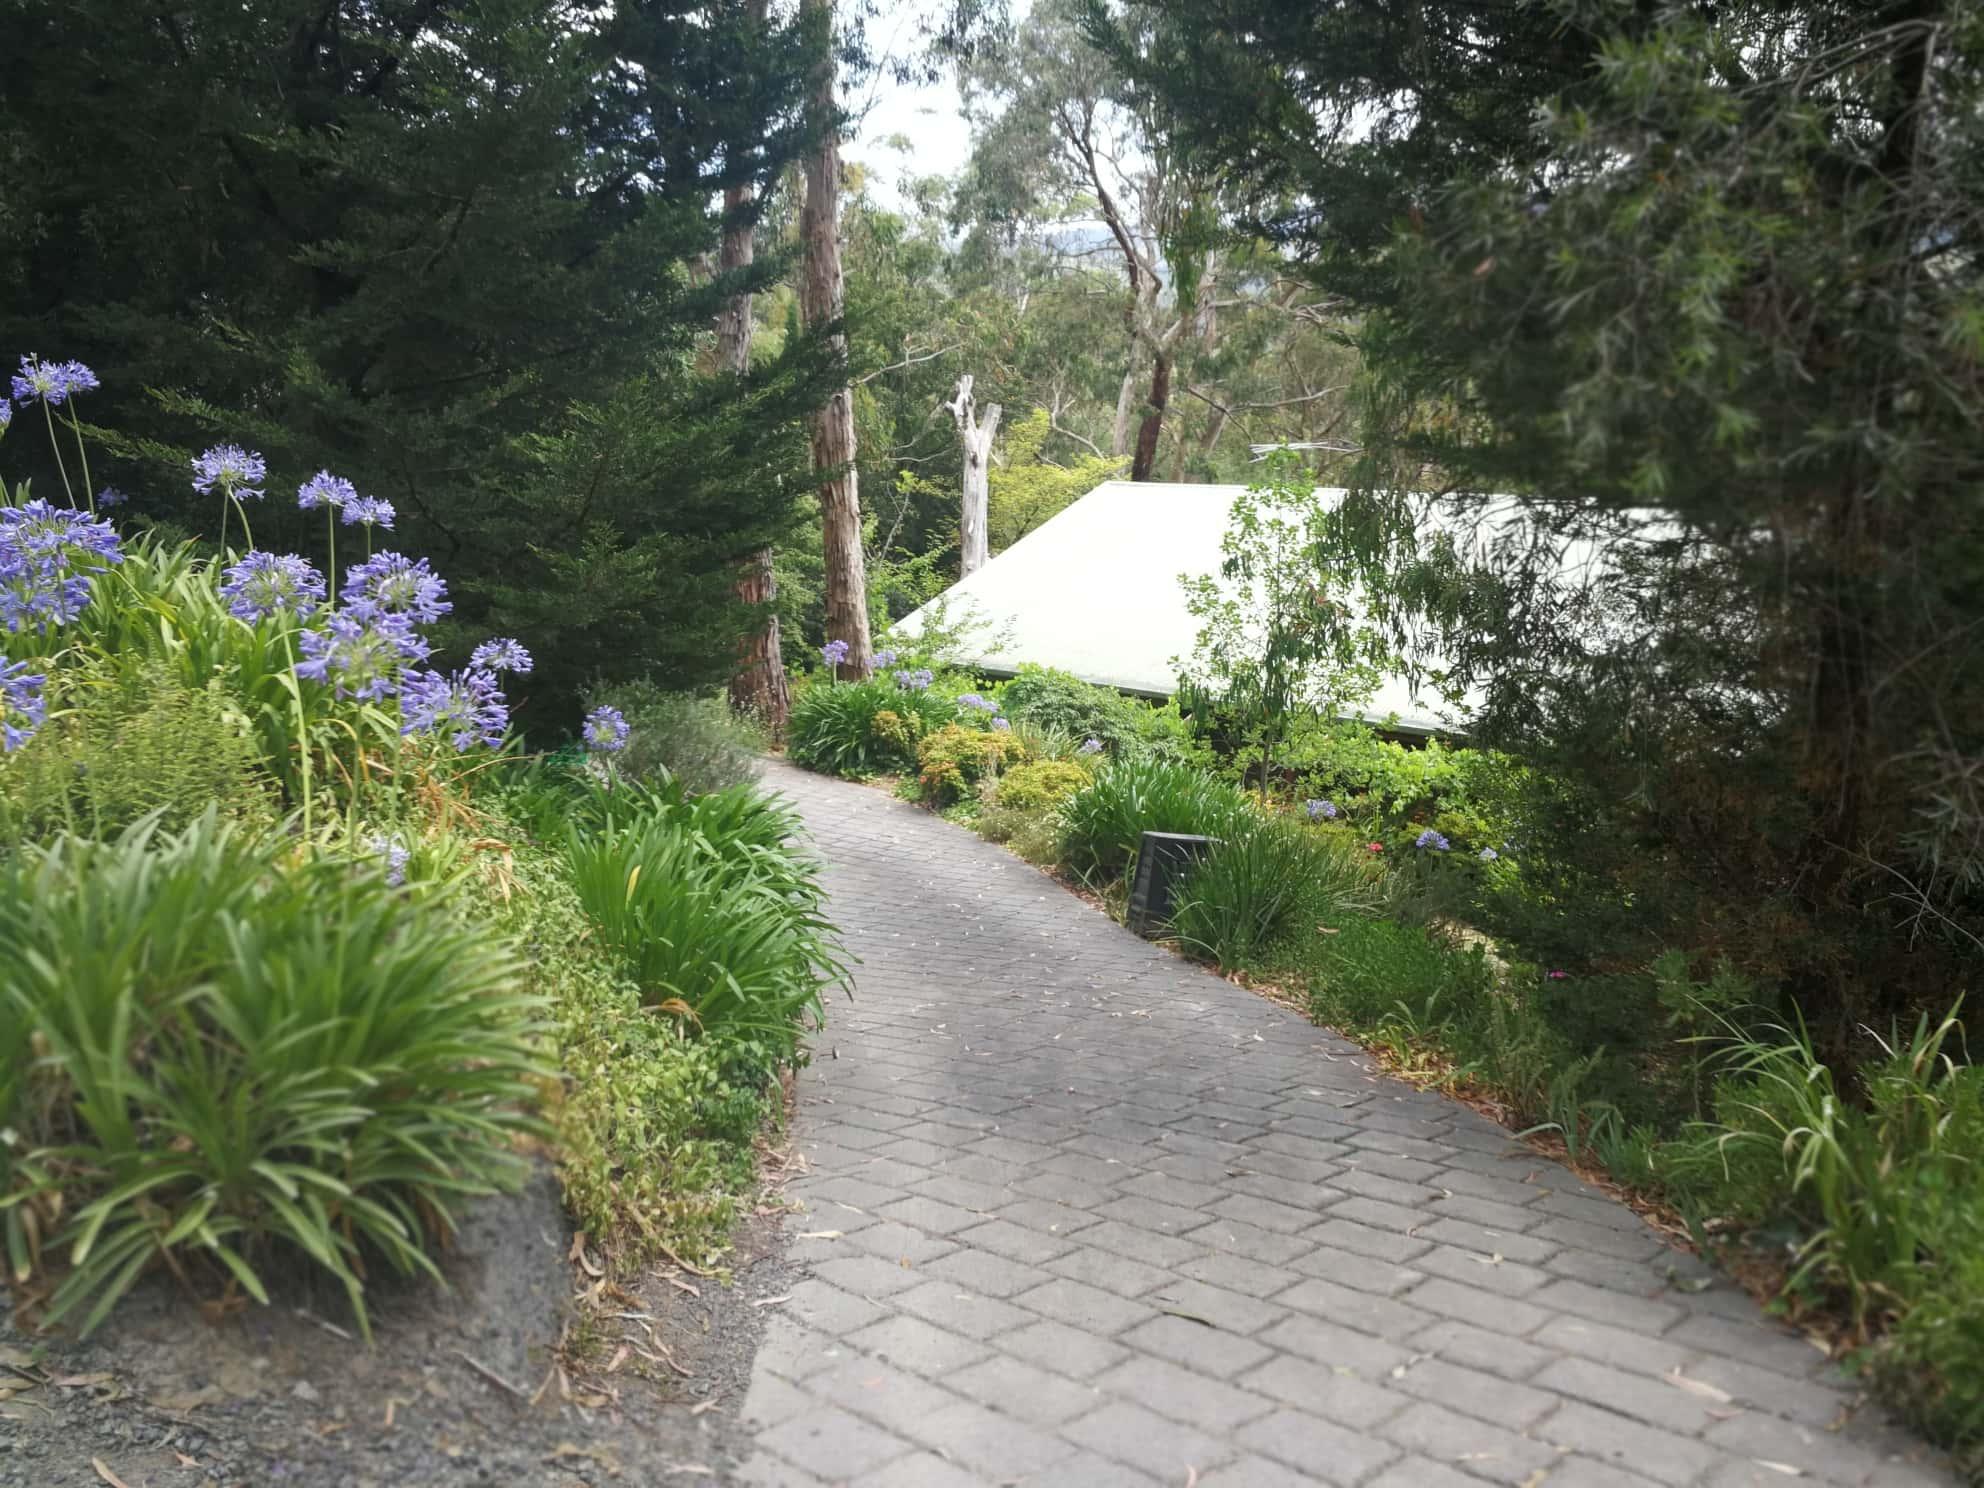 Preston House Removal to Belgrave - image IMG_20190116_114417_resized_20190117_082822406 on https://www.one2oneremovals.com.au